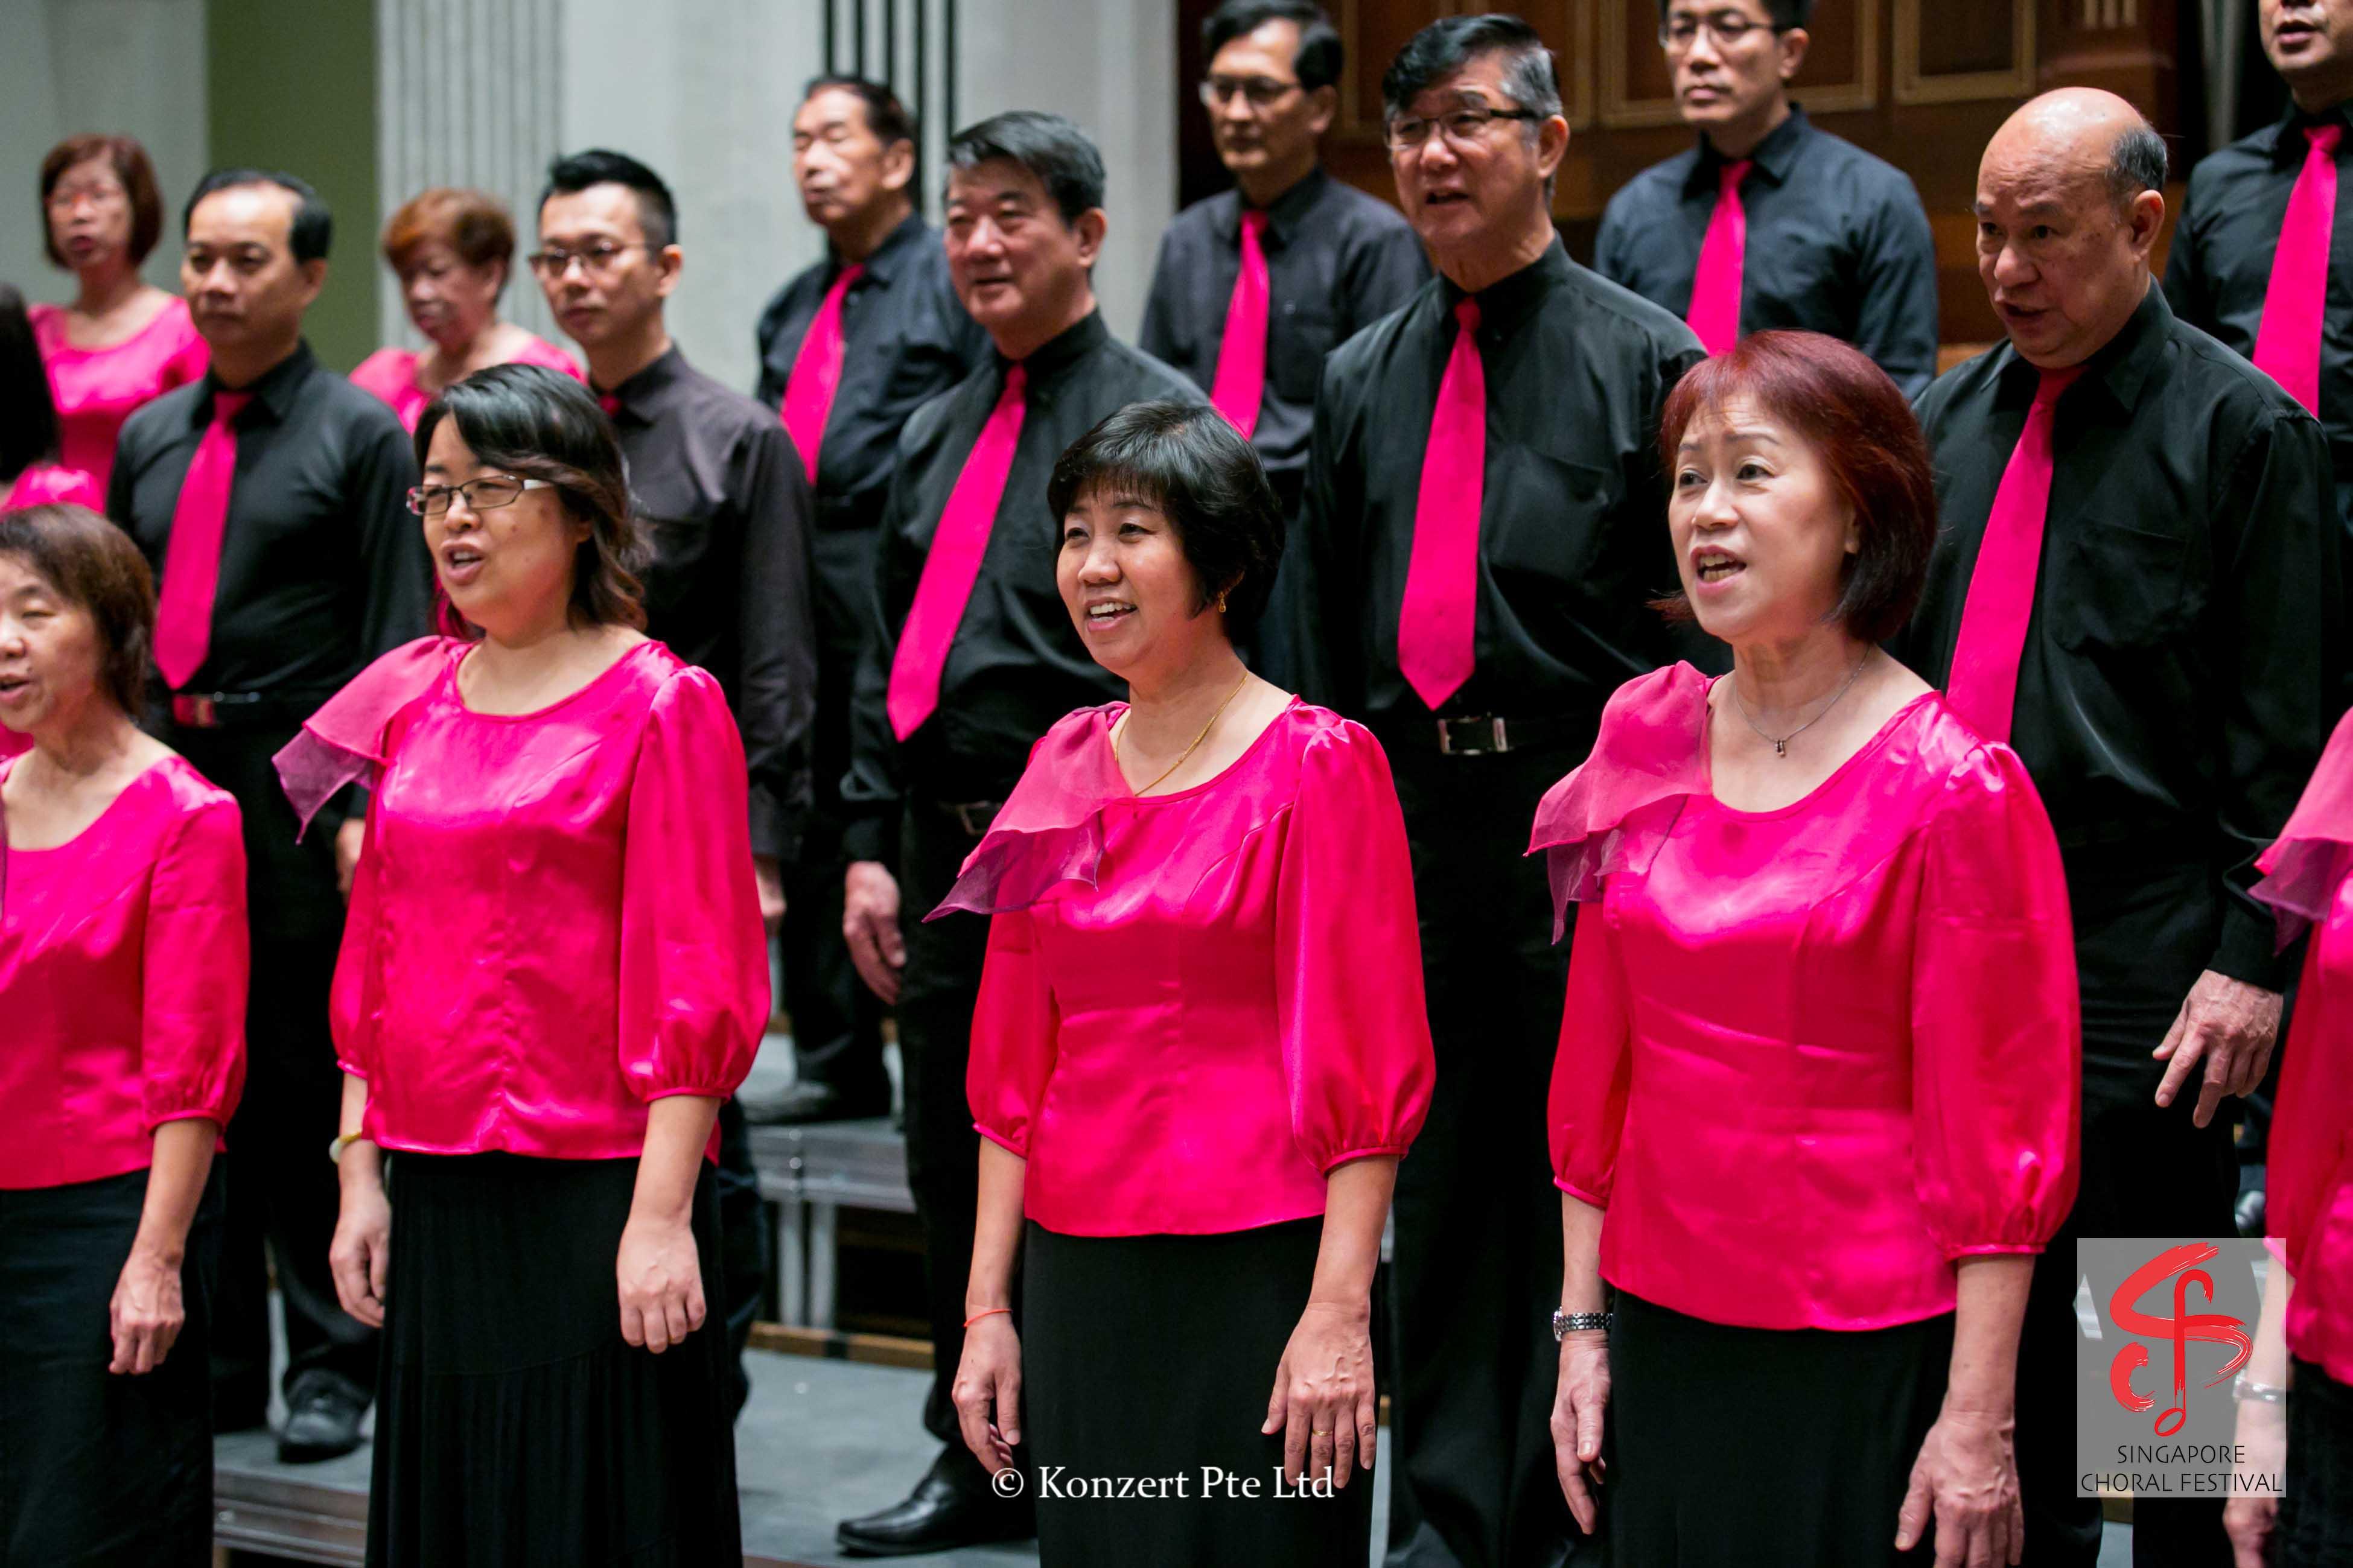 Singapore Choral Festival 7-8-15 (25).jpg